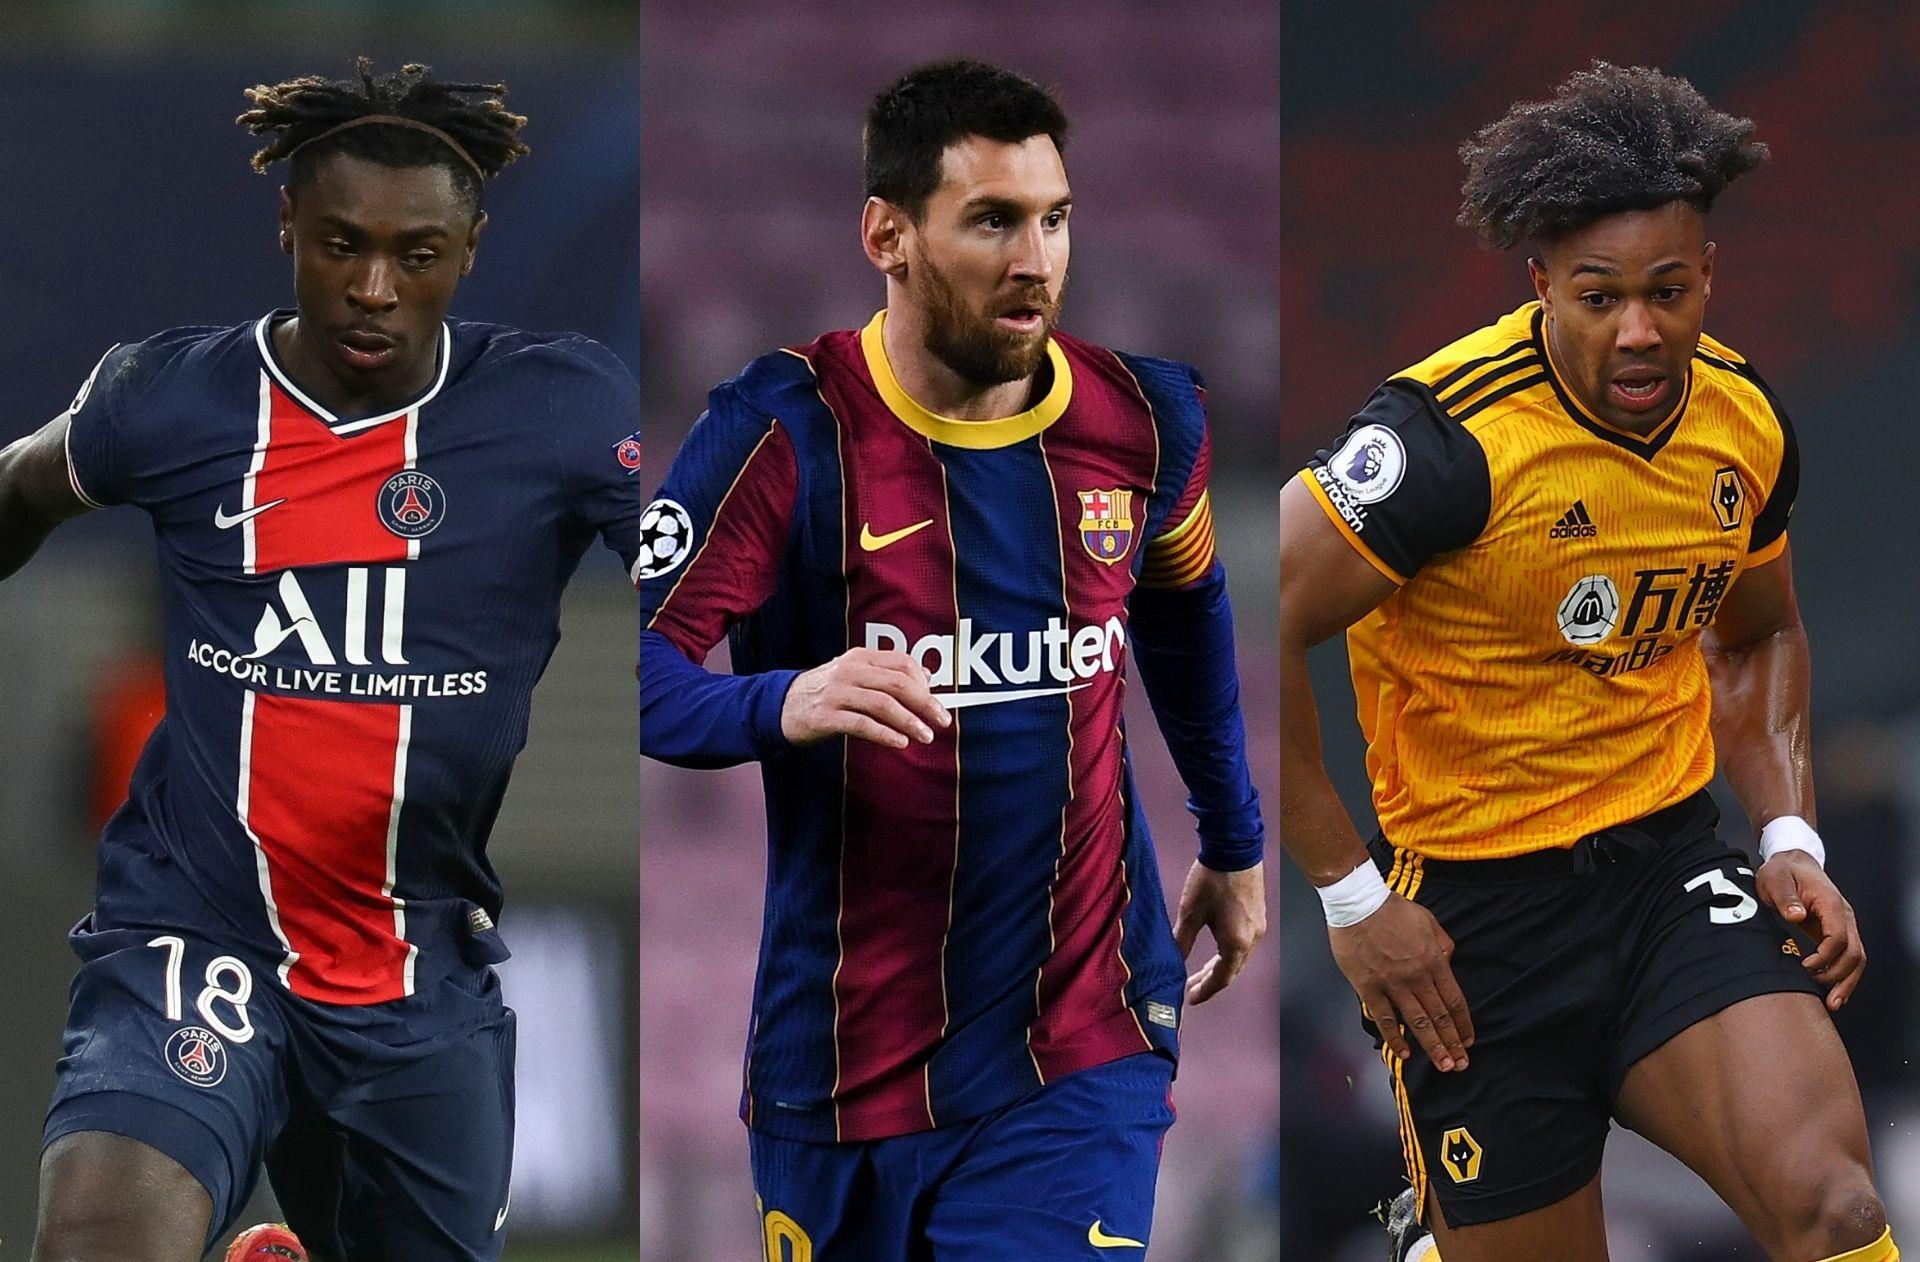 Moise Kean of Paris Saint-Germain, Lionel Messi of FC Barcelona, Adama Traore of Wolves